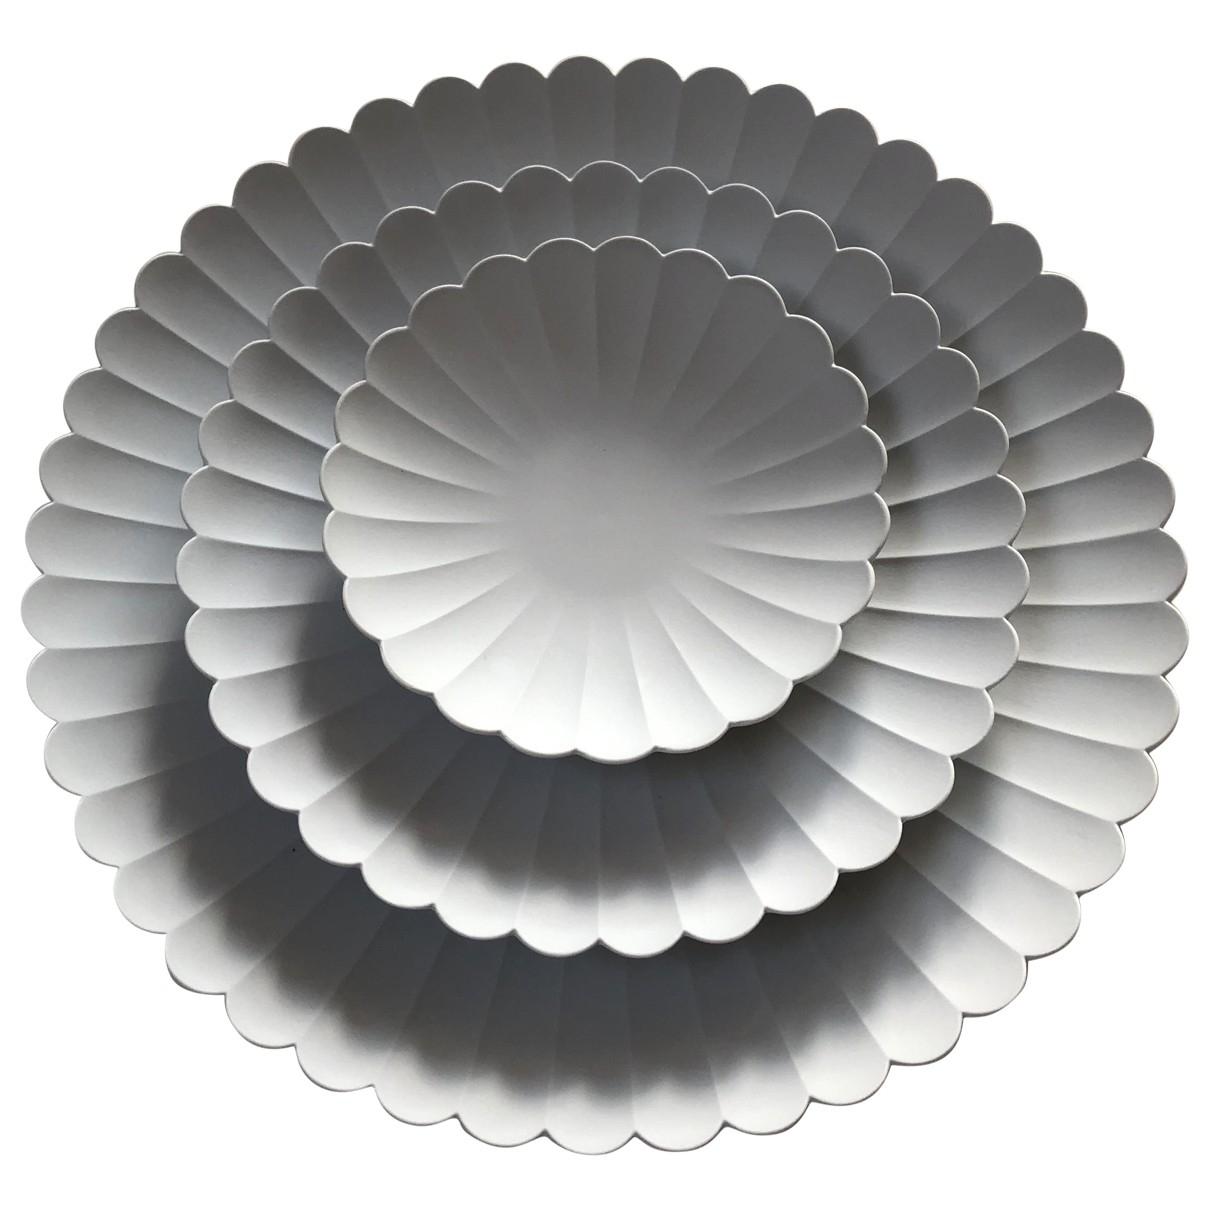 Platos de Porcelana Non Signe / Unsigned